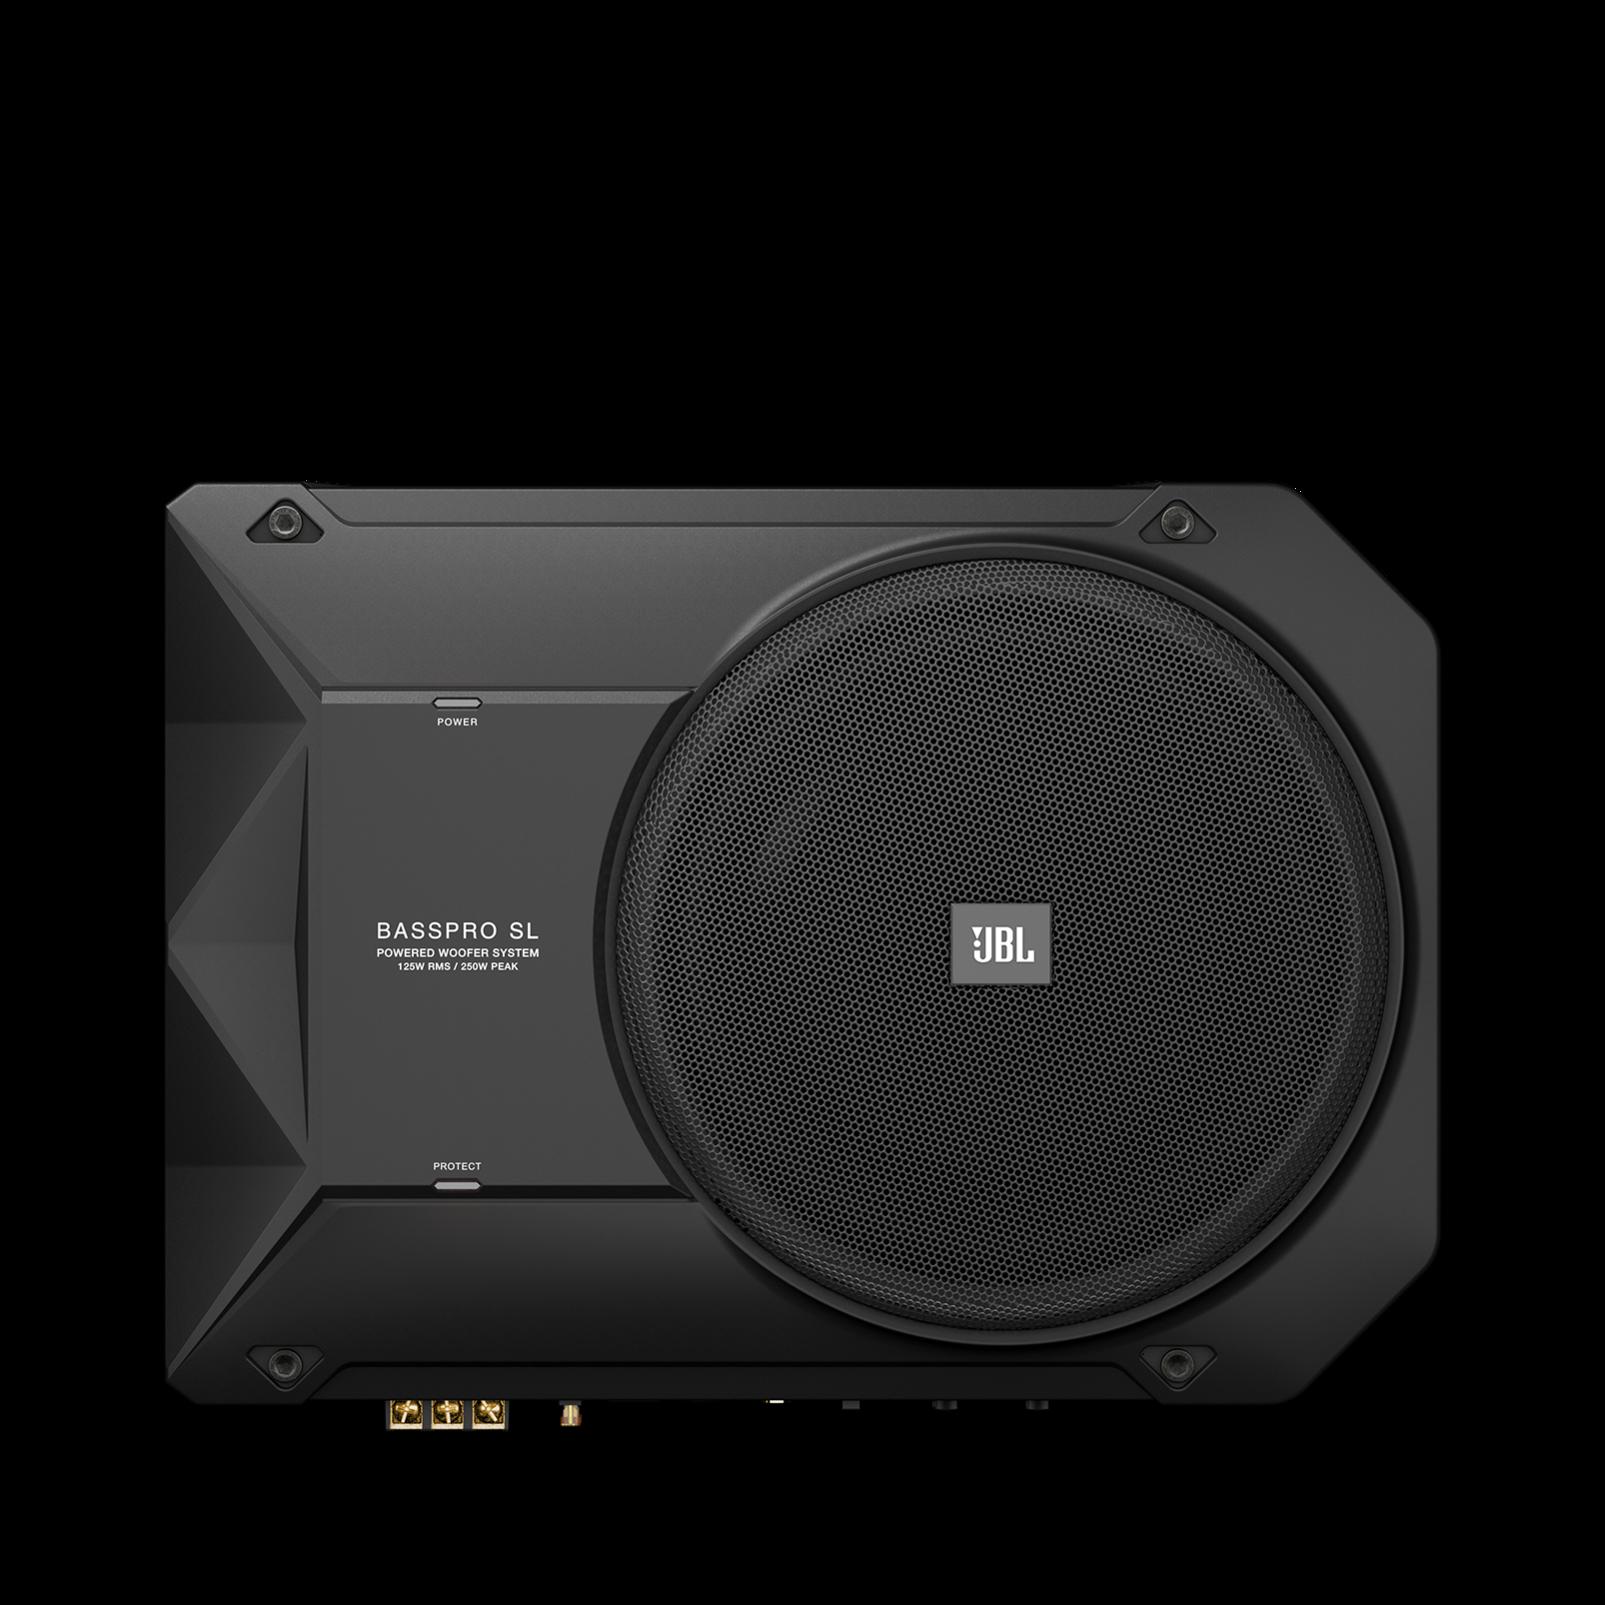 Car Audio System >> Basspro Sl